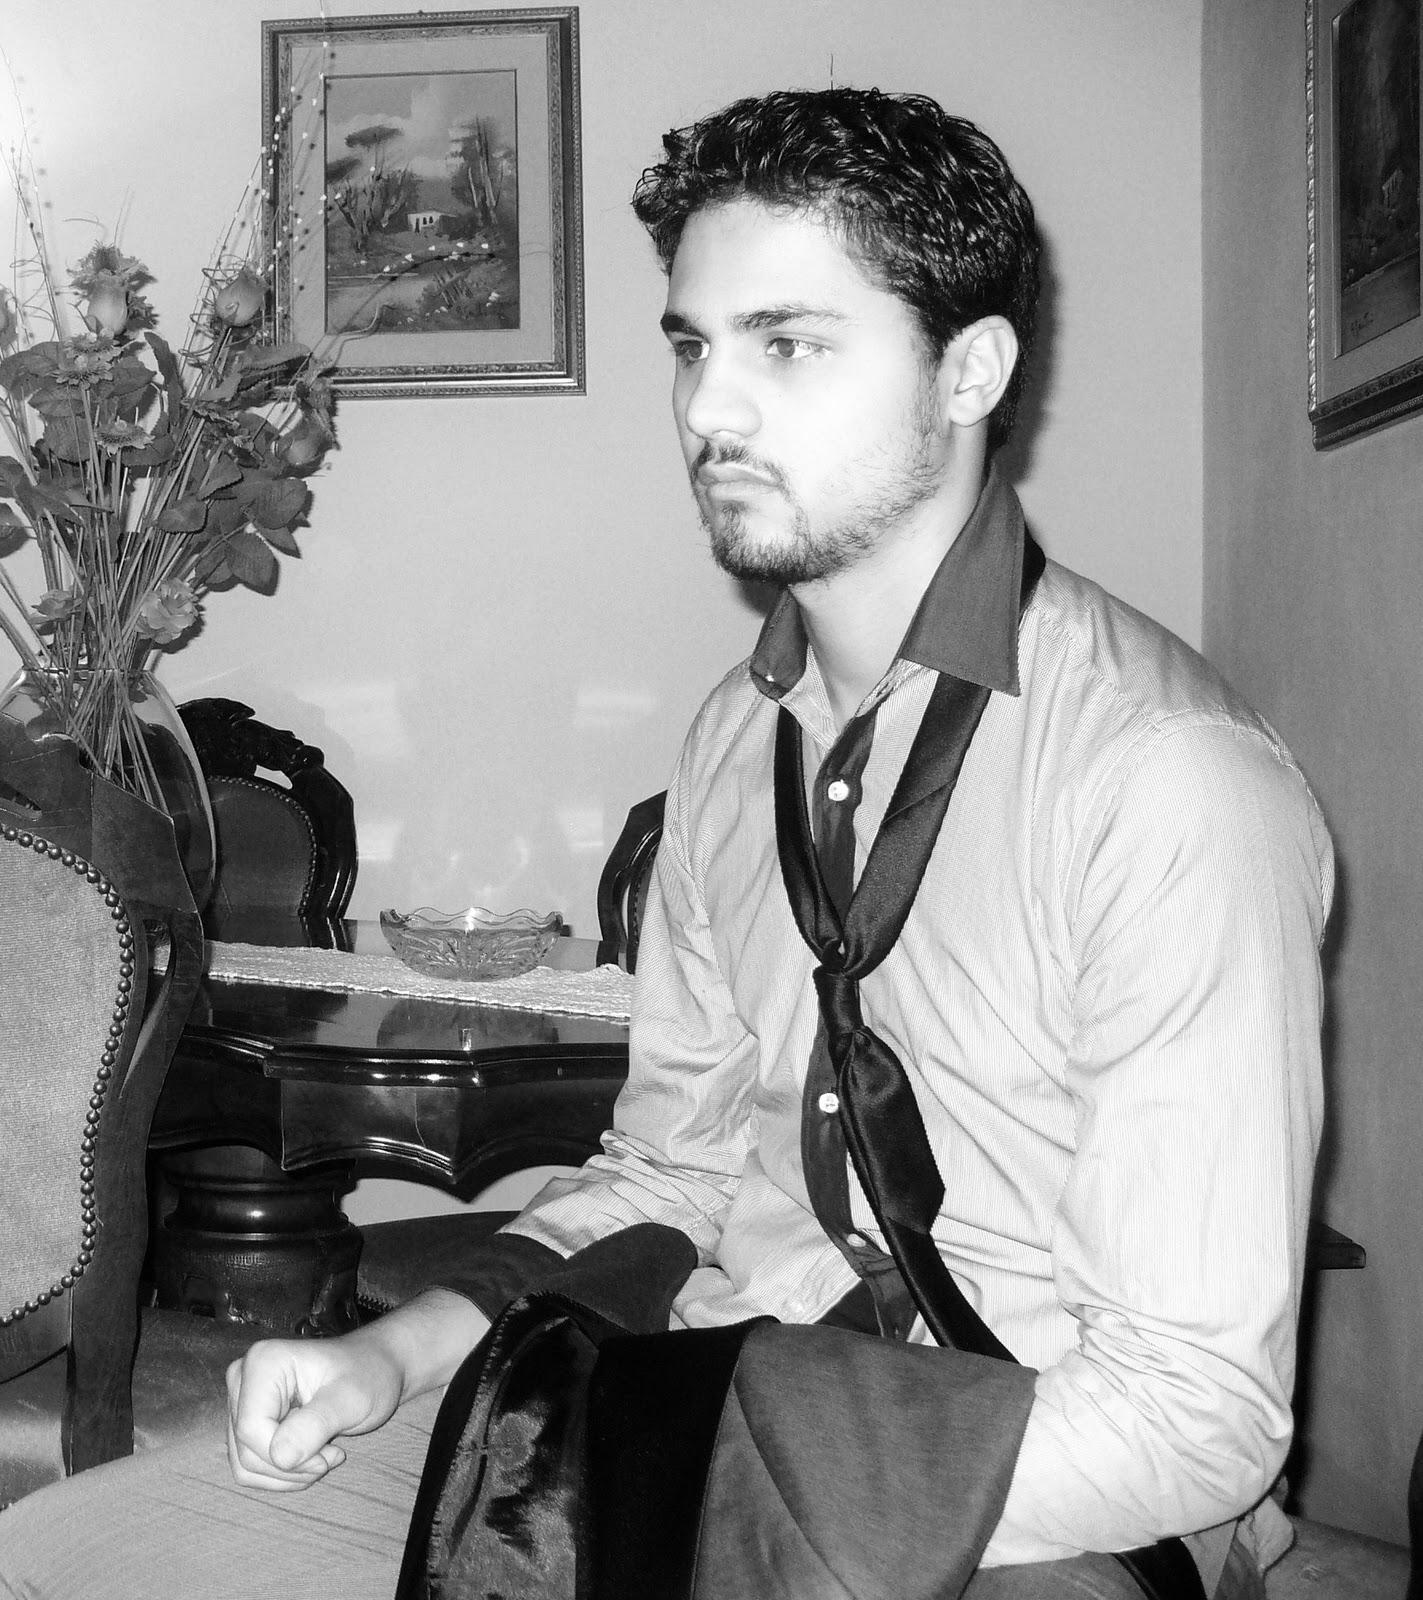 Matrimonio Capelli Uomo : Look taglio capelli uomo elegante per matrimonio o altre